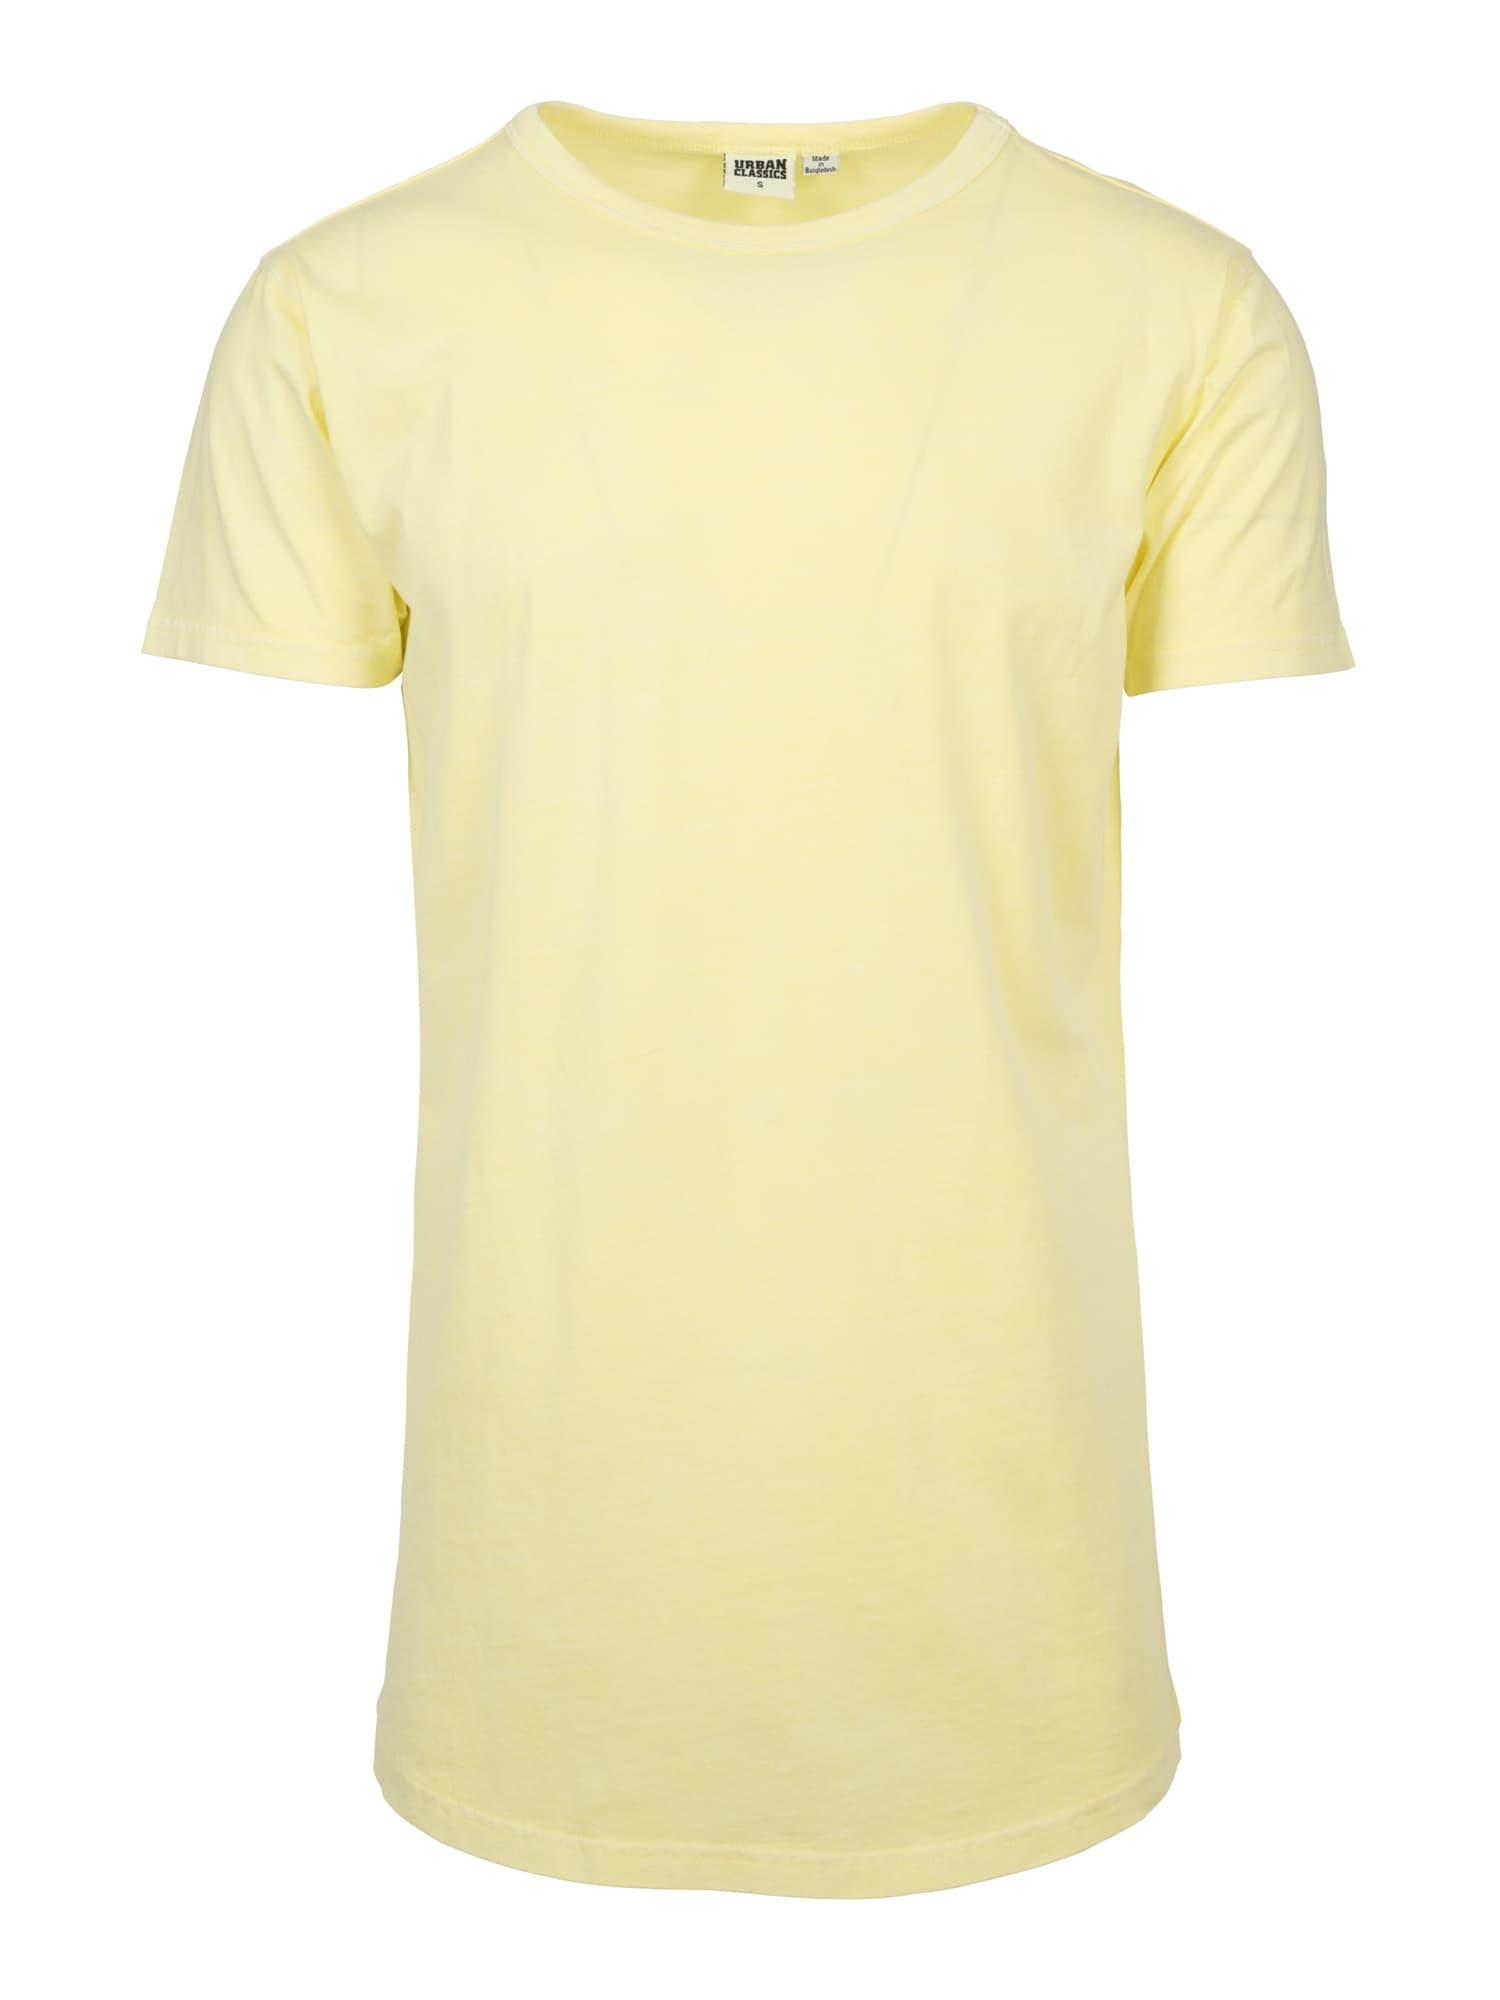 Urban Classics T-Shirt  - Jaune - Taille: M - male